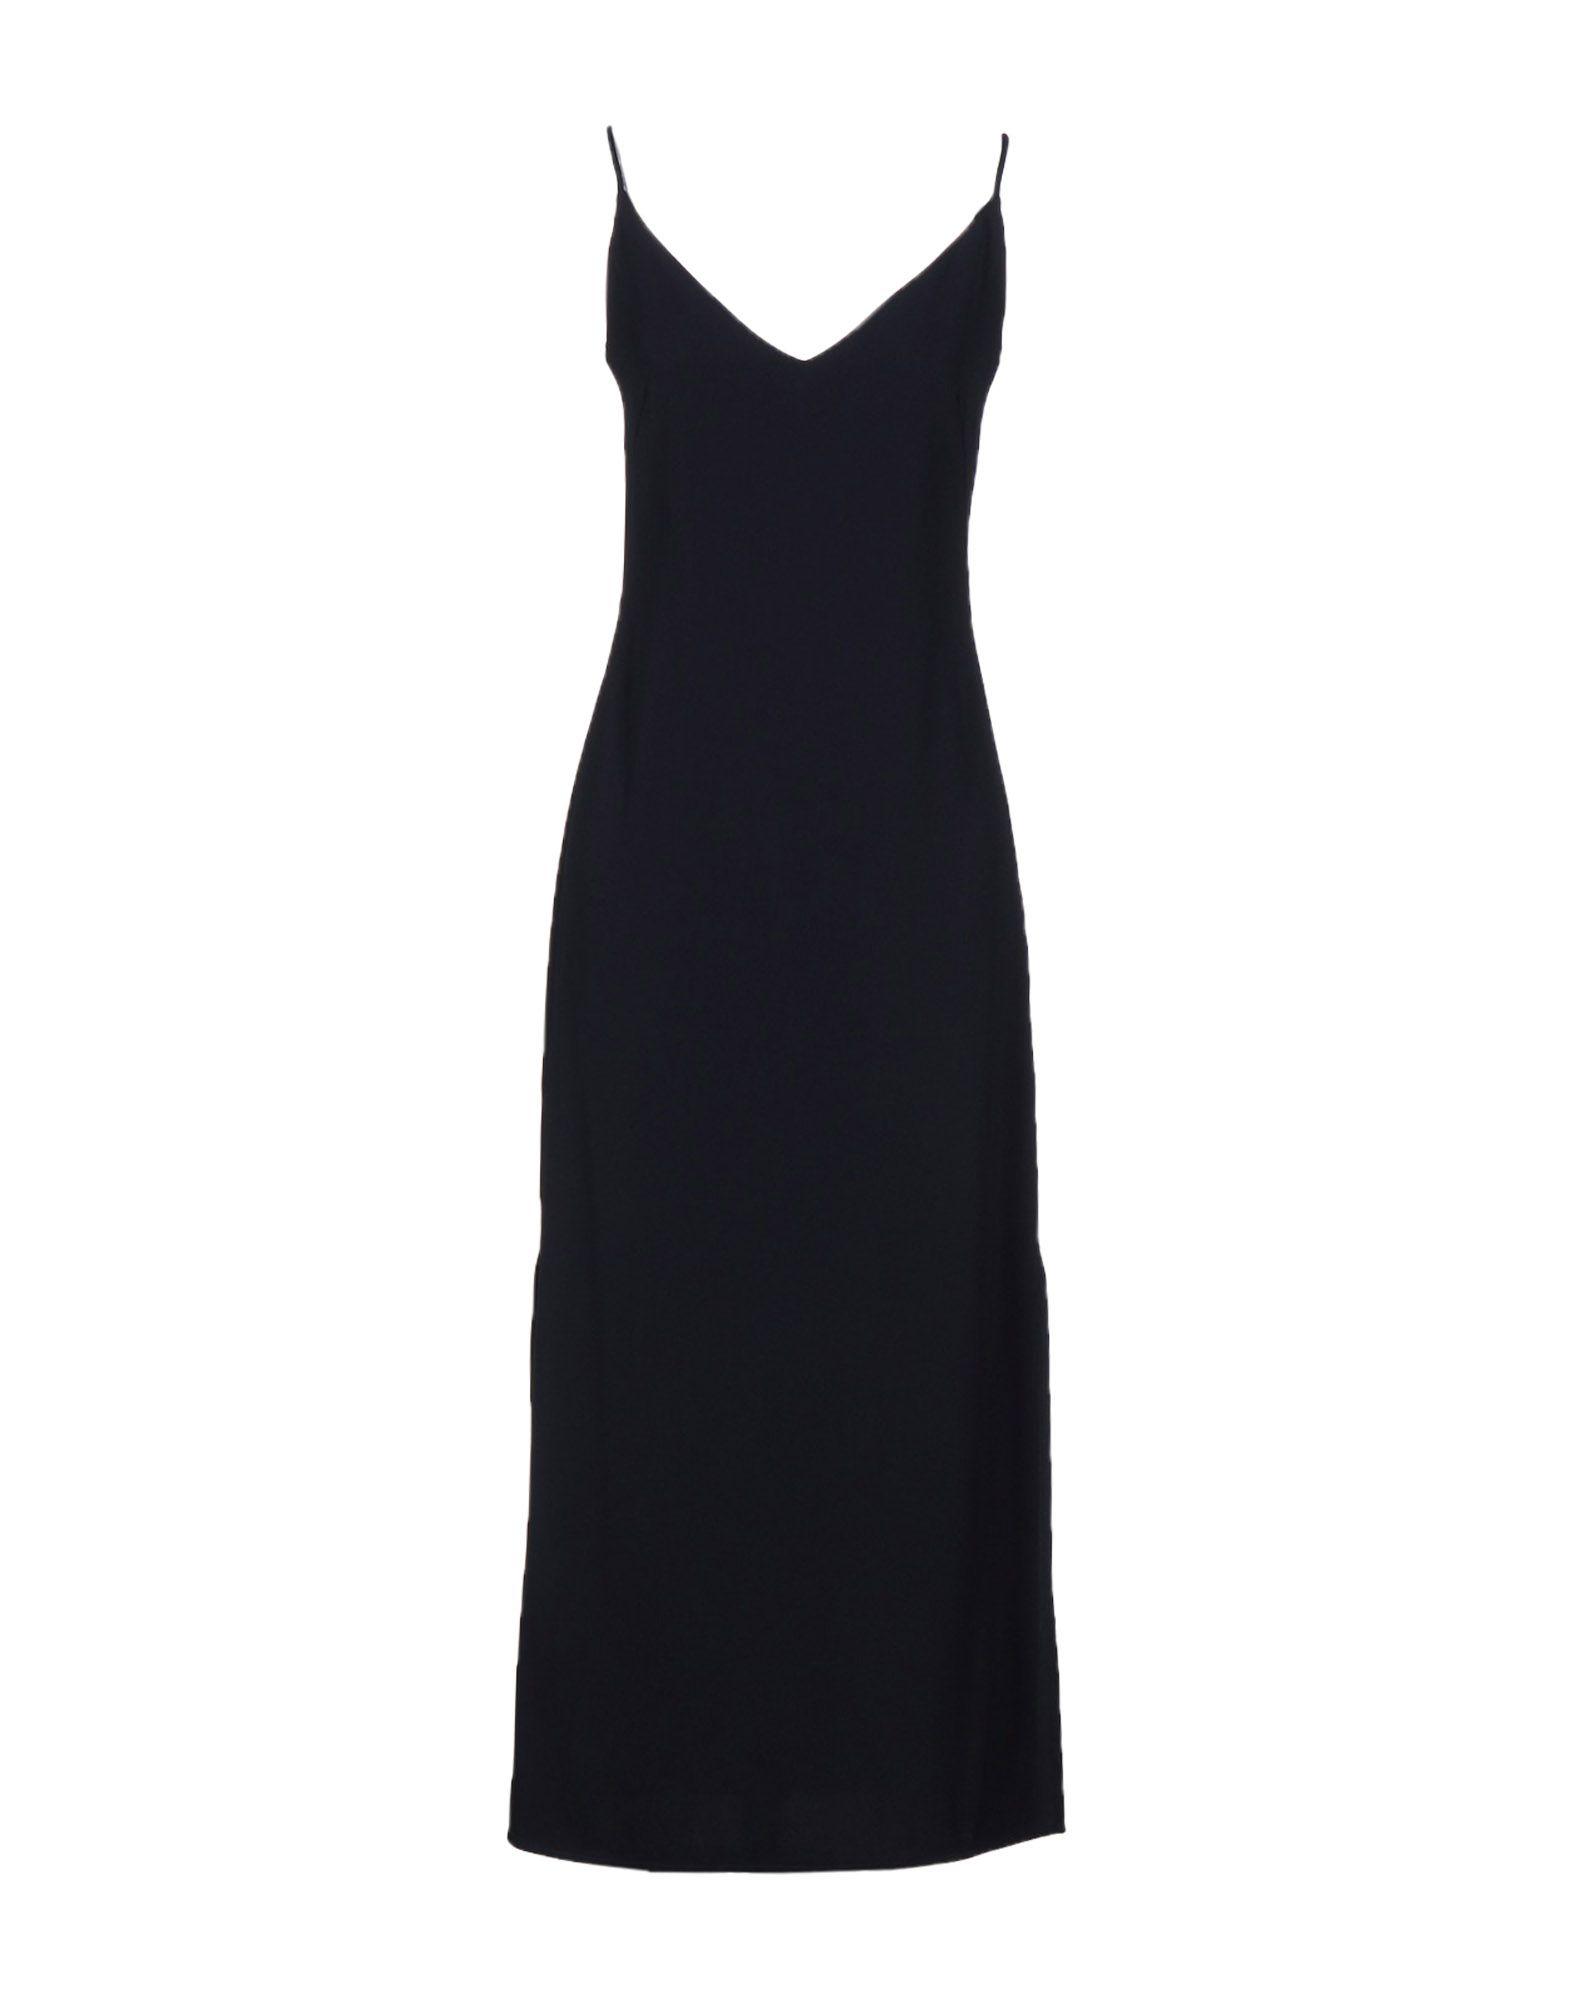 ATEA OCEANIE Long Dress in Dark Blue